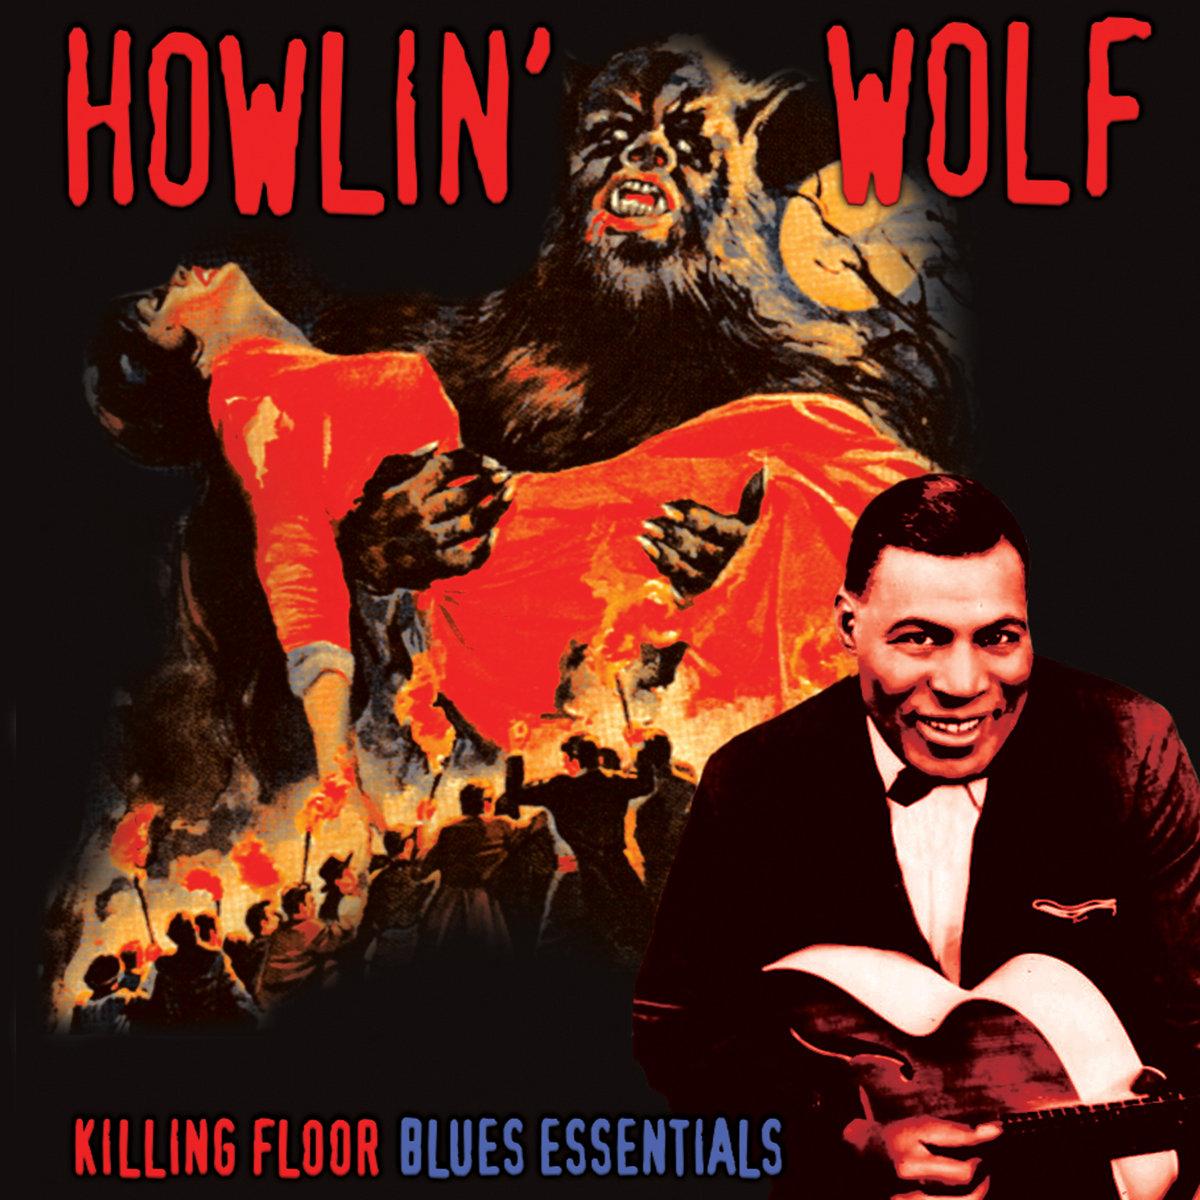 Killing Floor Blues Essentials Howlin Wolf